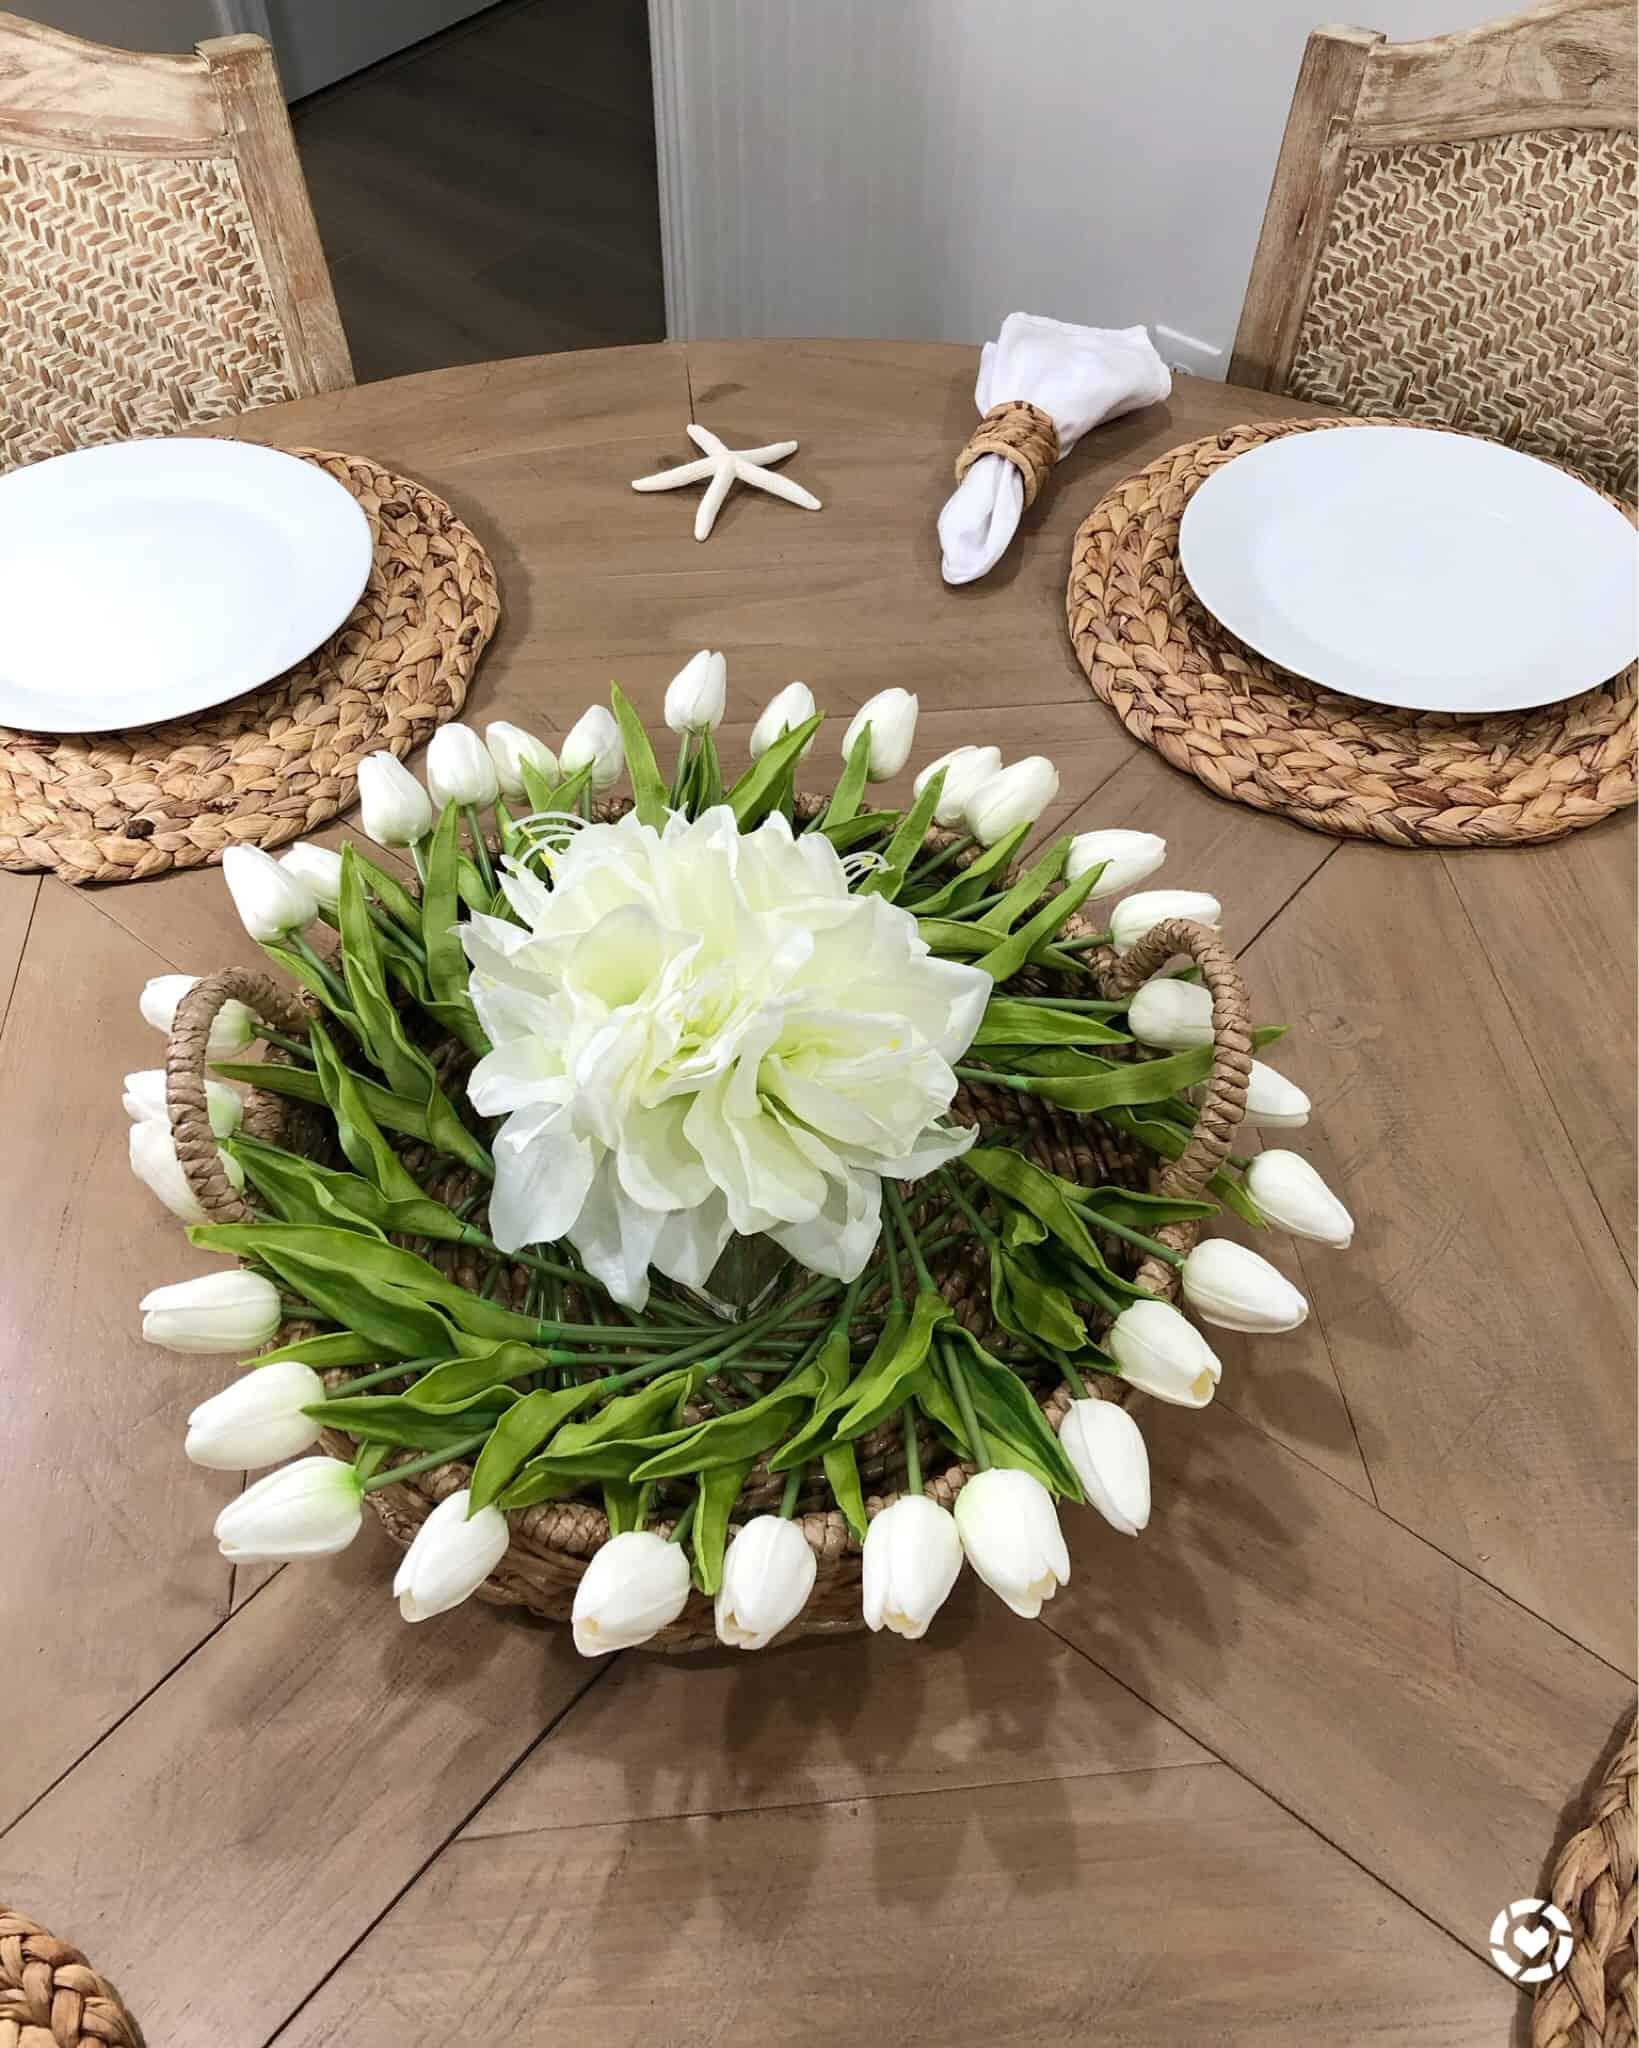 DIY Spring Table Centerpiece